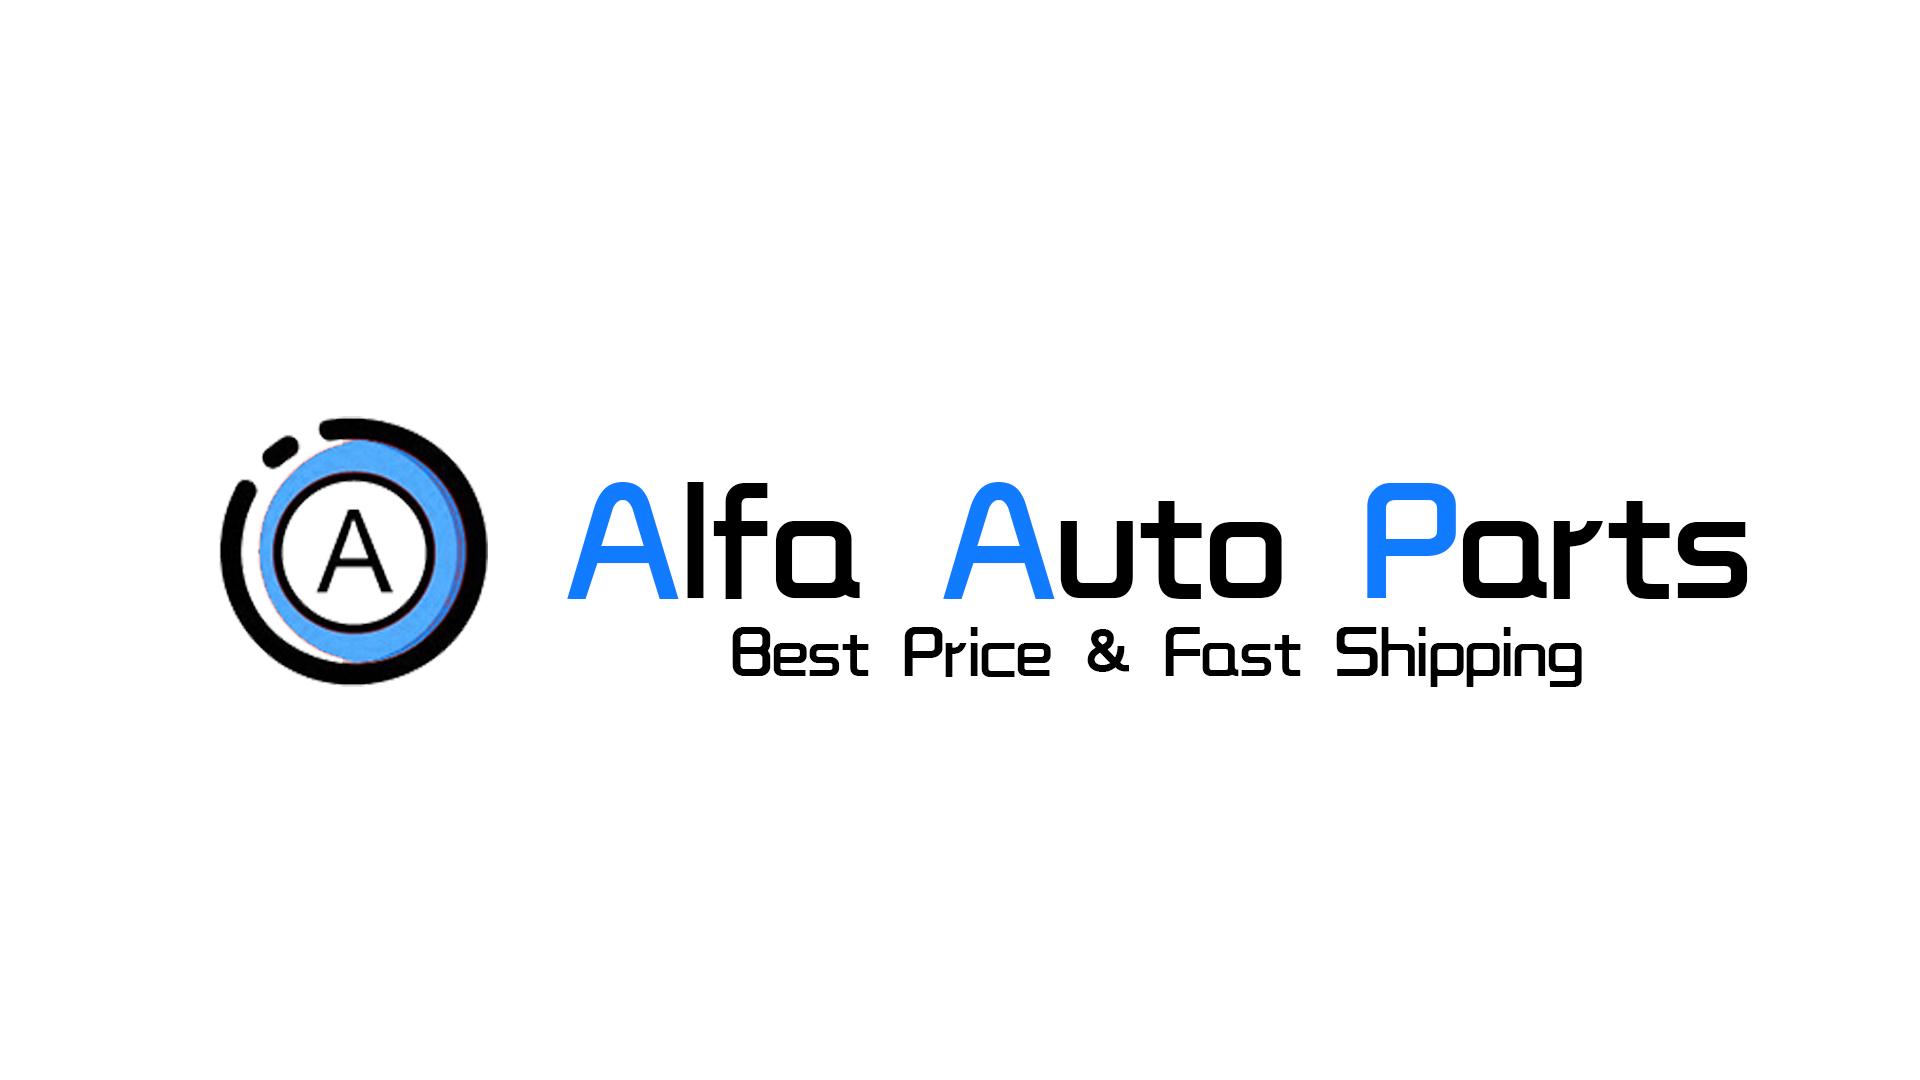 Alfa Auto Parts